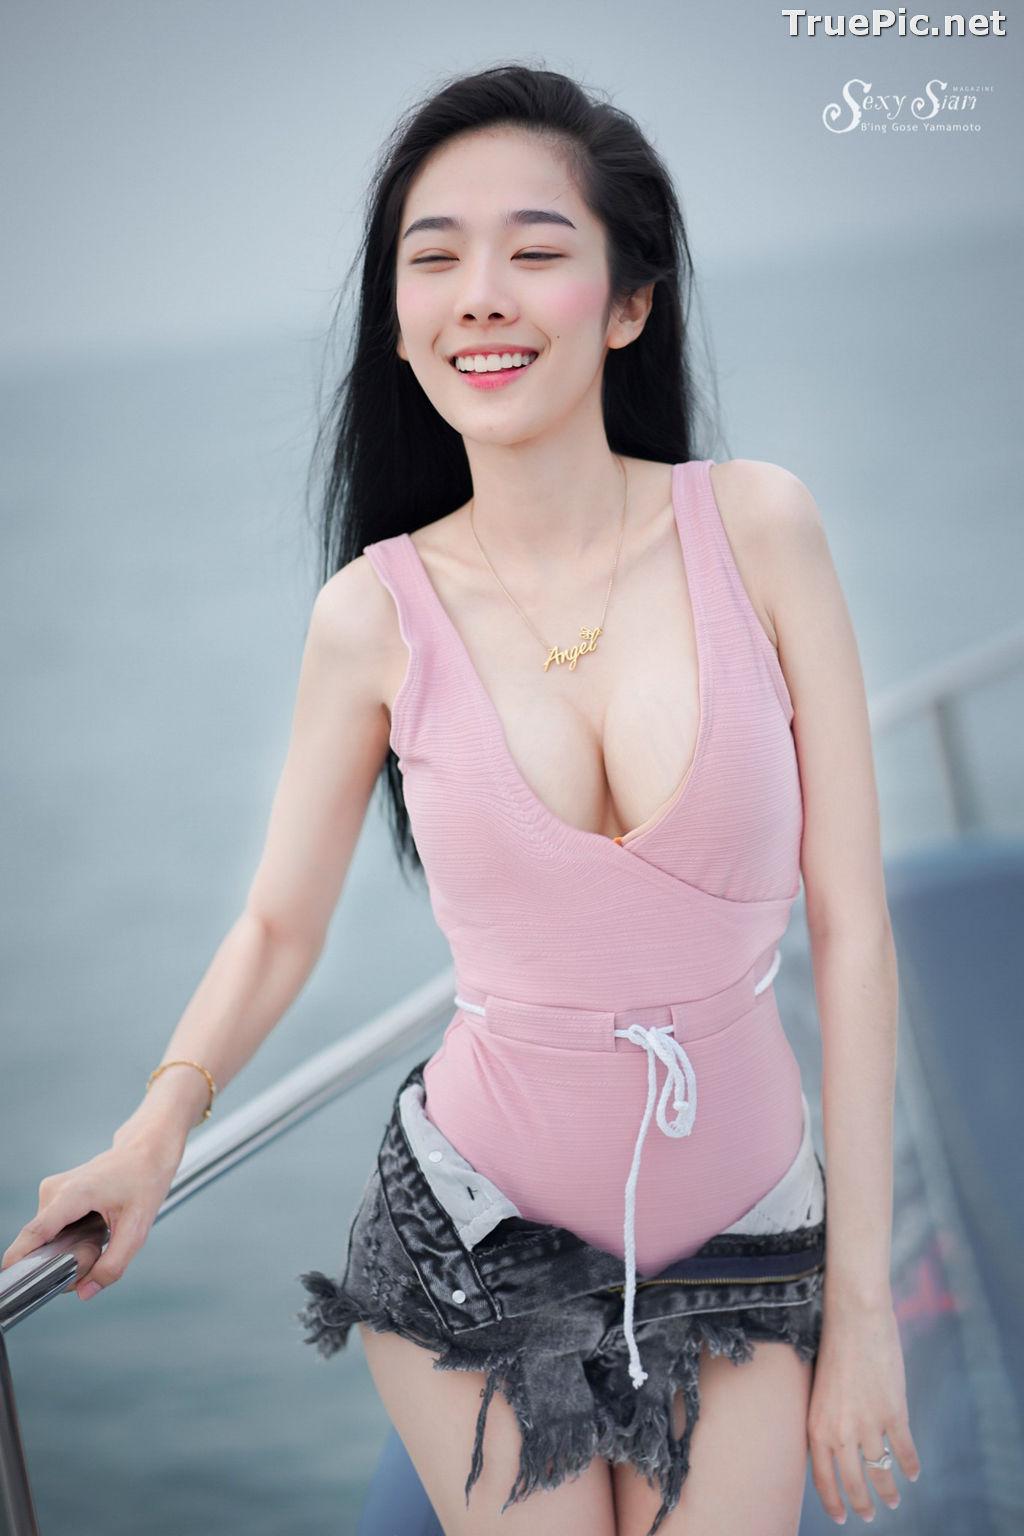 Image Thailand Model - Patcharin Srikunchai - Pink Monokini and Jean Pants - TruePic.net - Picture-7